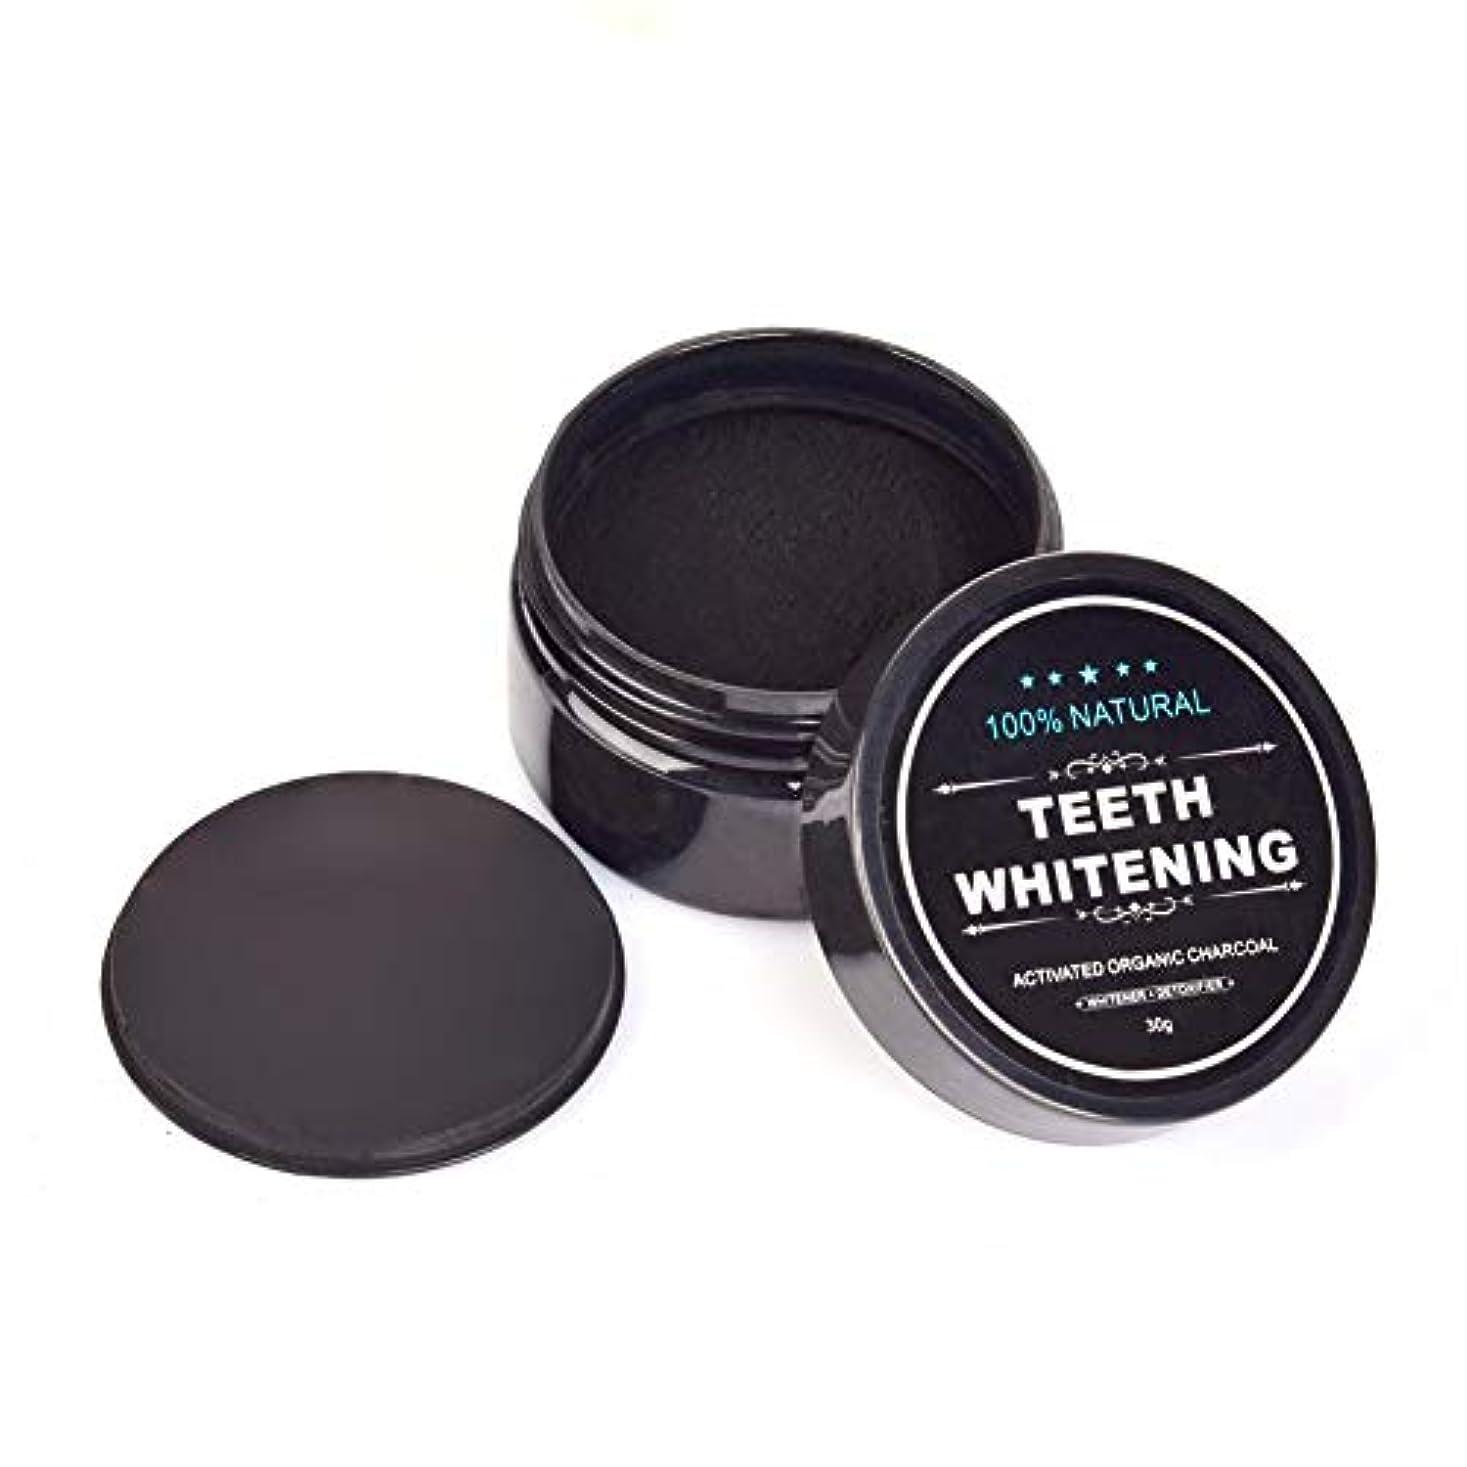 SILUN チャコールホワイトニング 歯 ホワイトニング チャコール型 マイクロパウダー 歯 ホワイトニング 食べれる活性炭 竹炭 歯を白くする歯磨き粉 活性炭パウダー